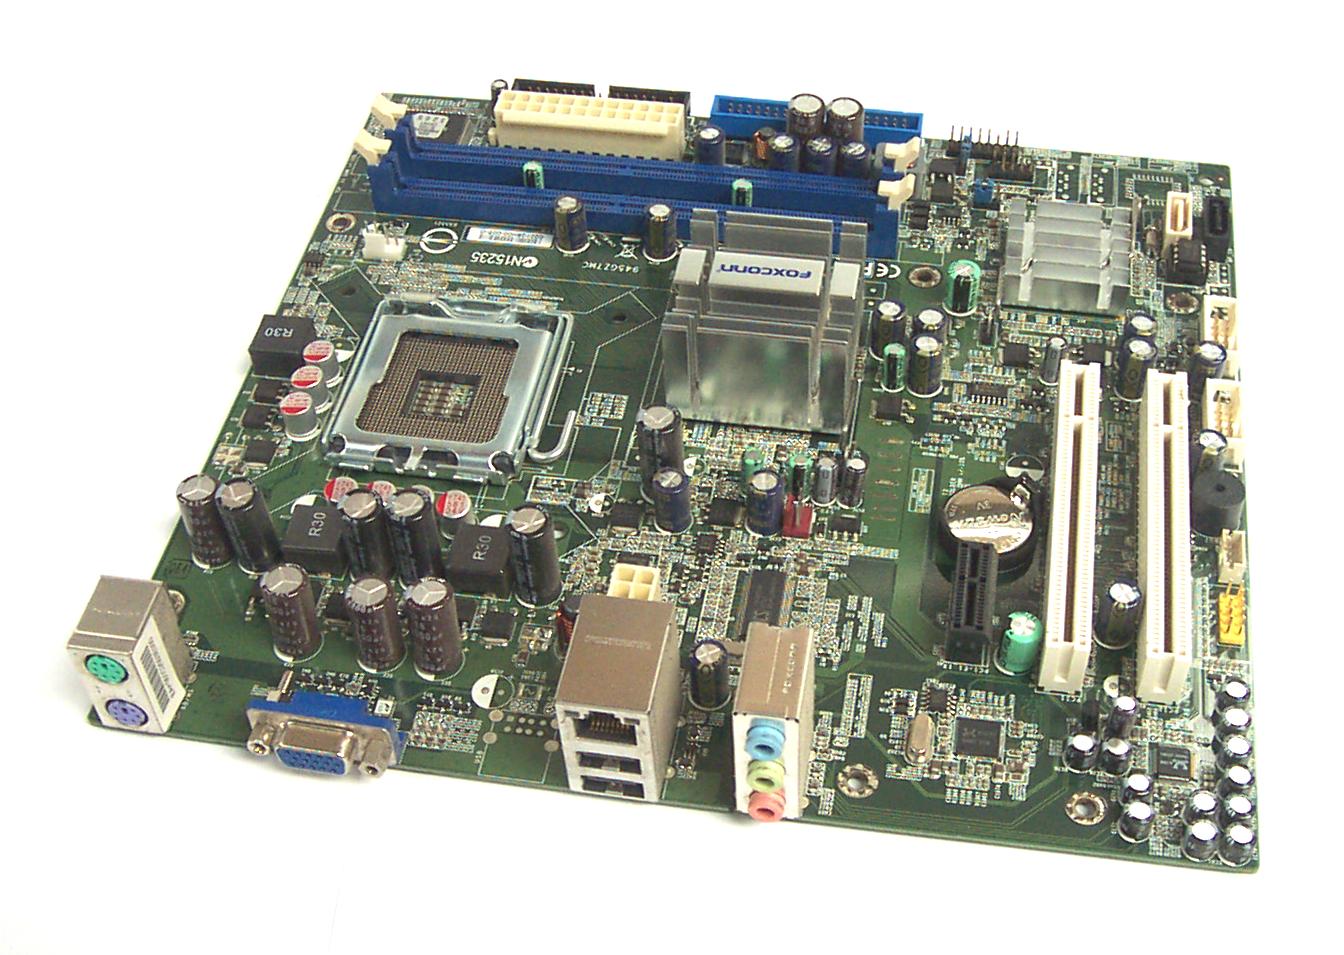 FOXCONN MOTHERBOARD 945GZ7MC WINDOWS 8 X64 TREIBER